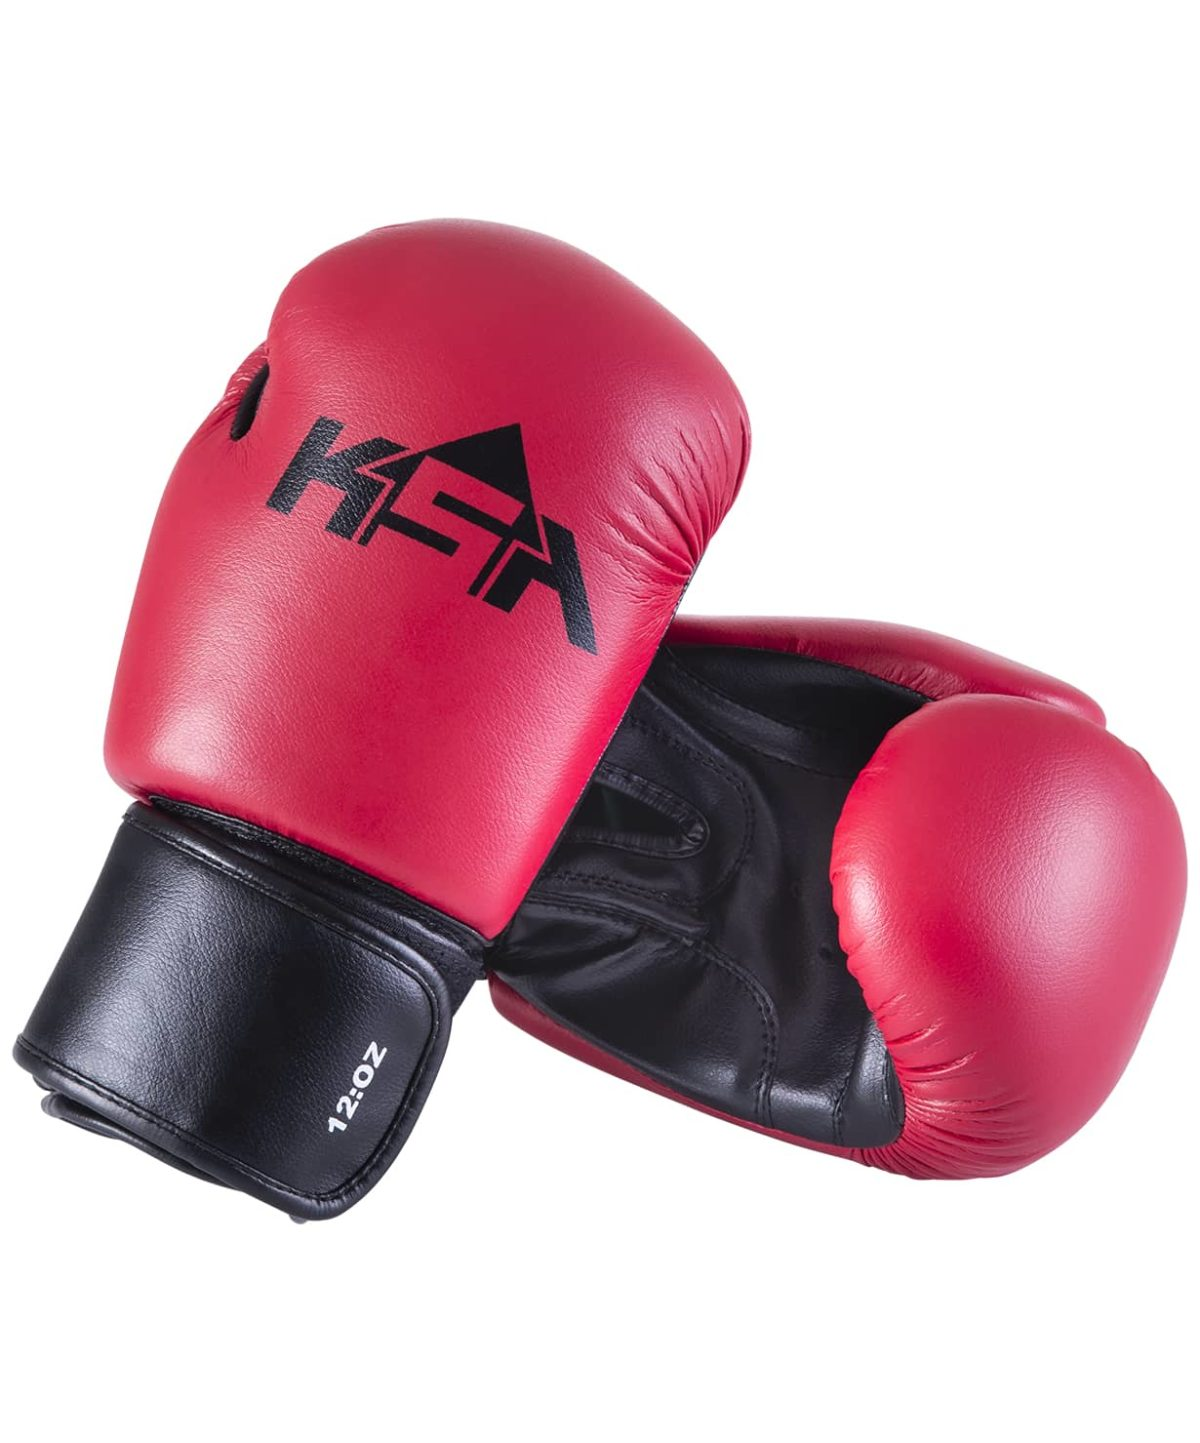 KSA Spider Red Перчатки боксерские, 4 oz, к/з 17809 - 1